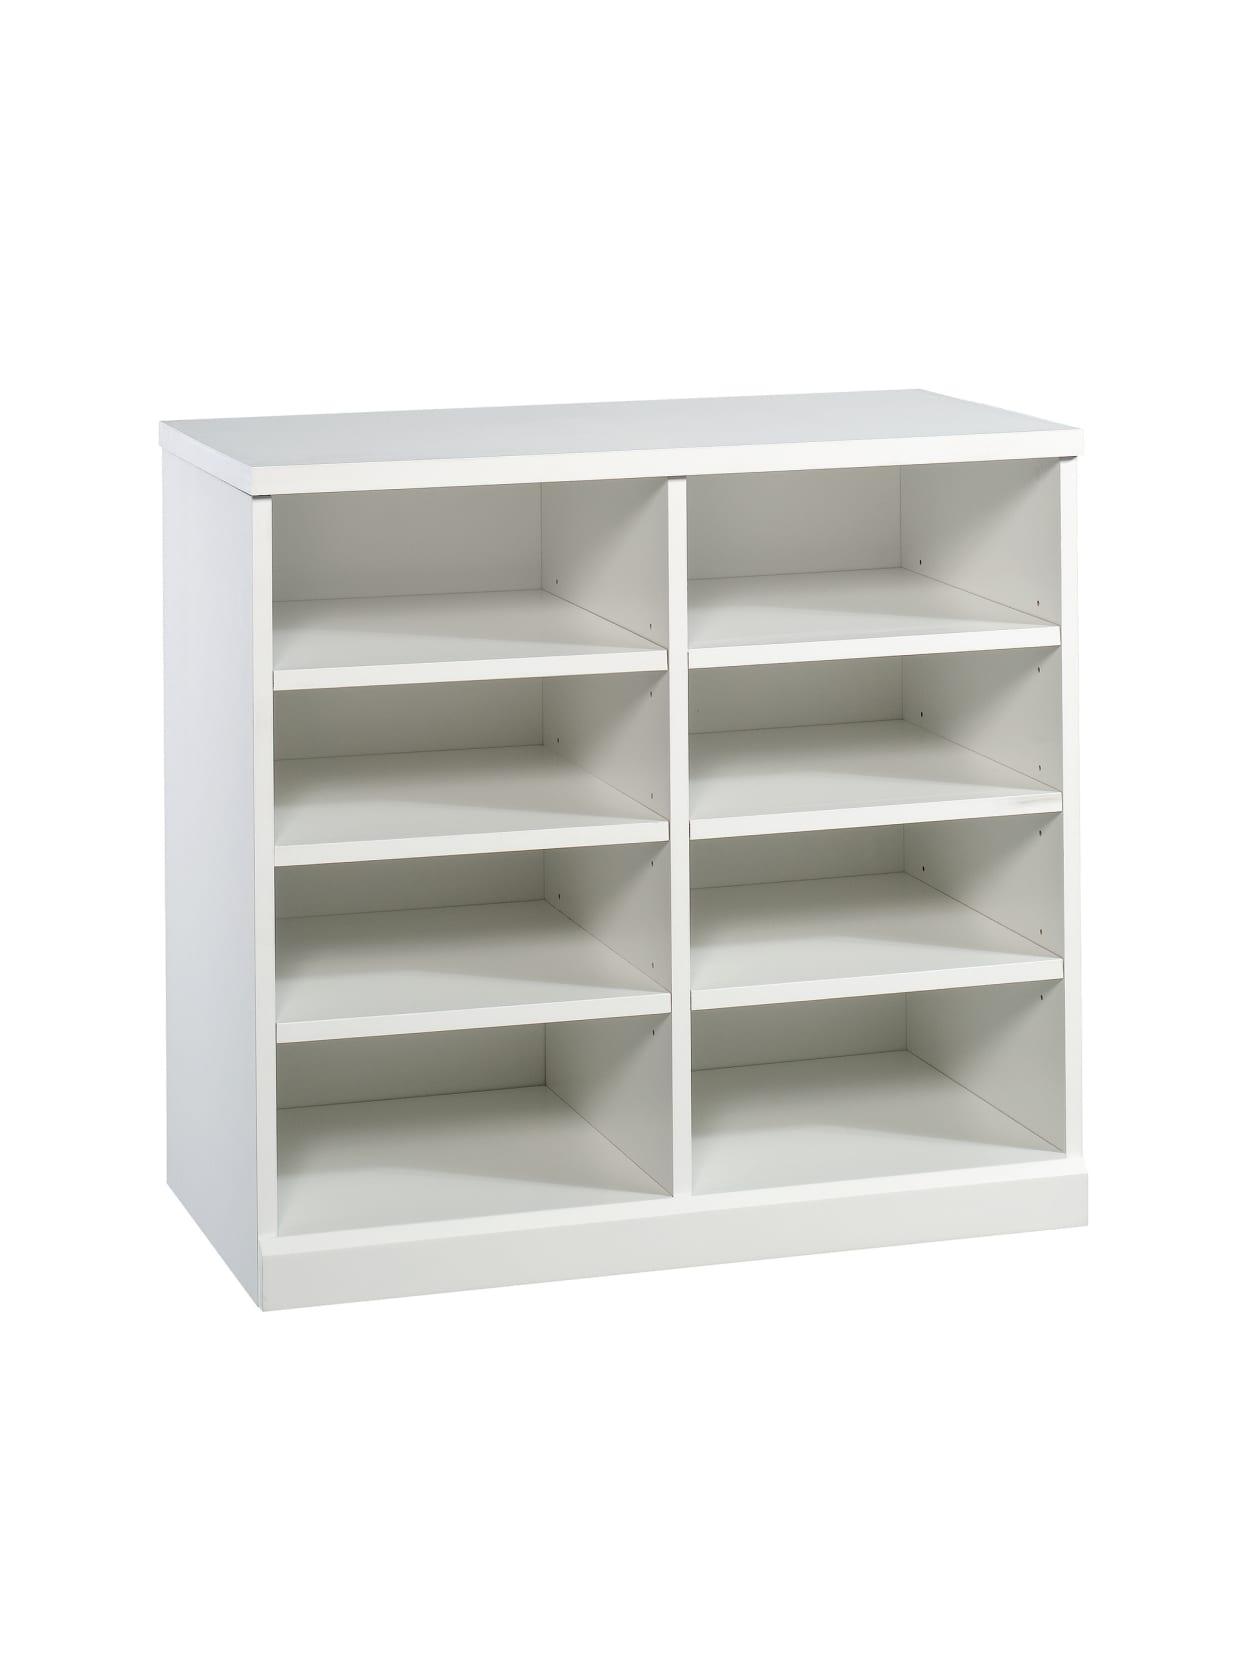 Sauder Craft Pro Series Open Storage Cabinet 8 Shelves White Office Depot